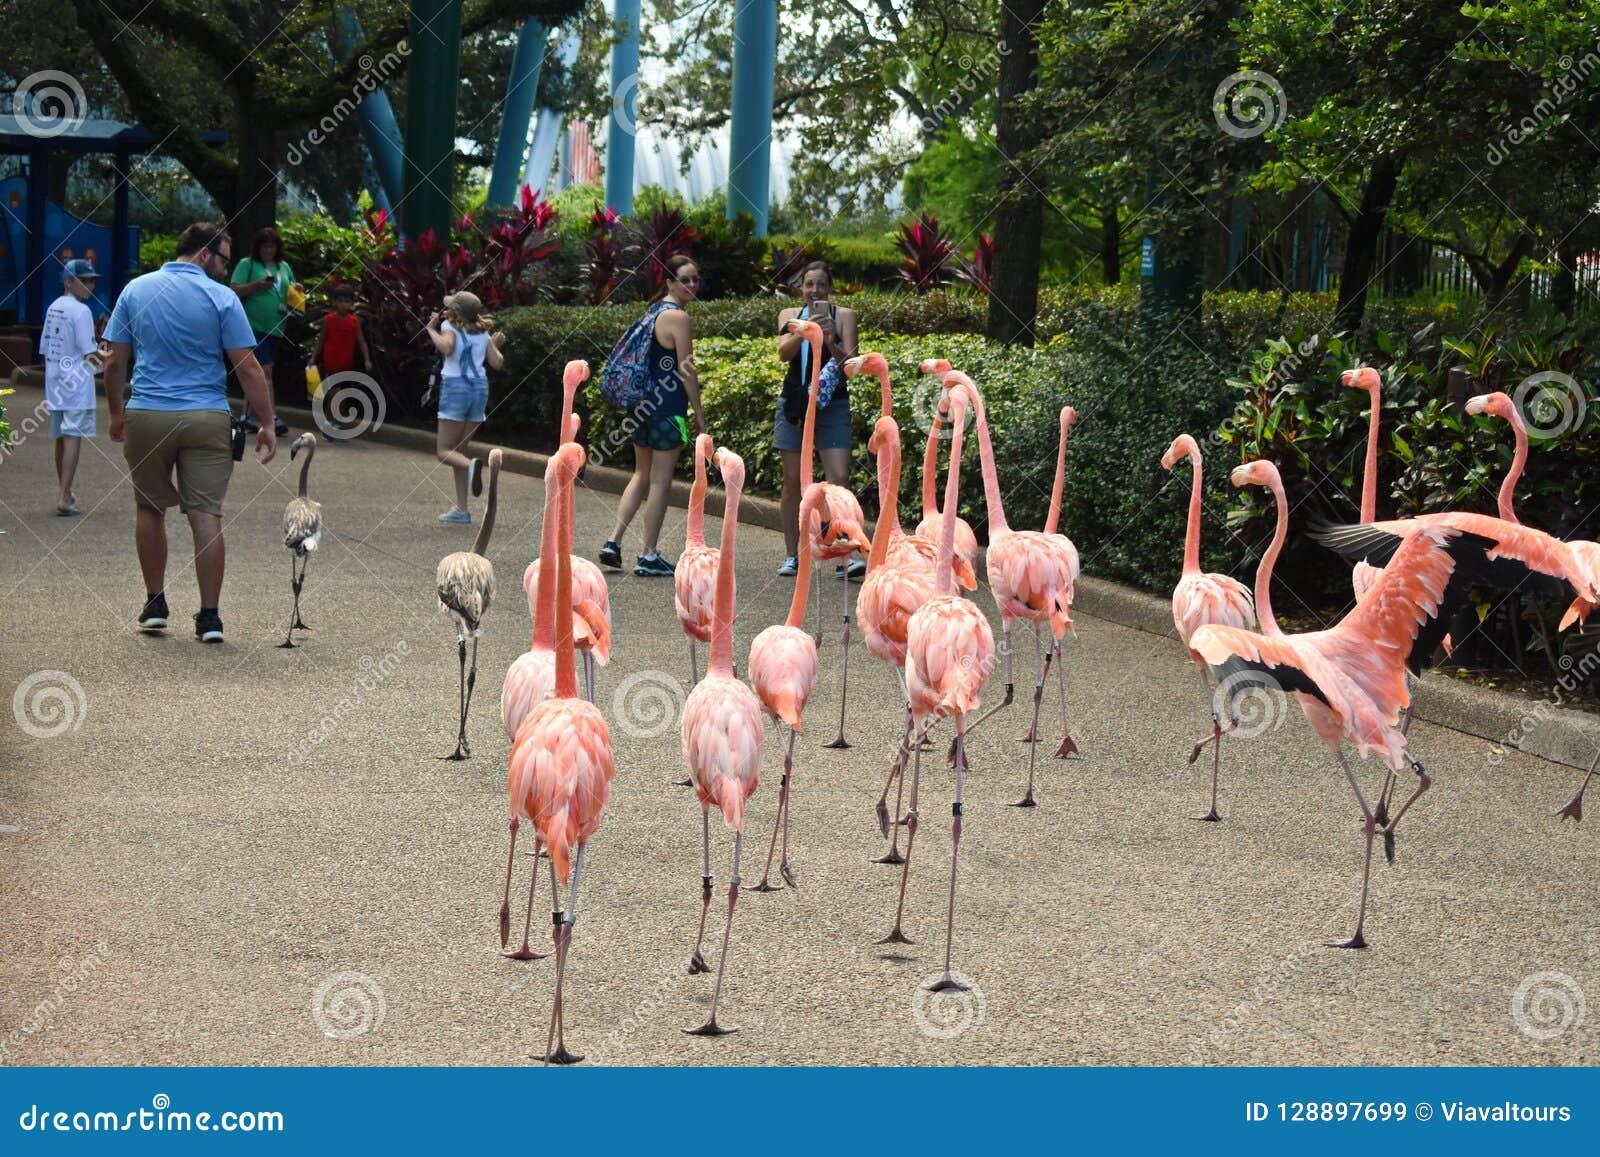 Girls taking pictures of flamingos walking among people in Seaworld Theme Park.